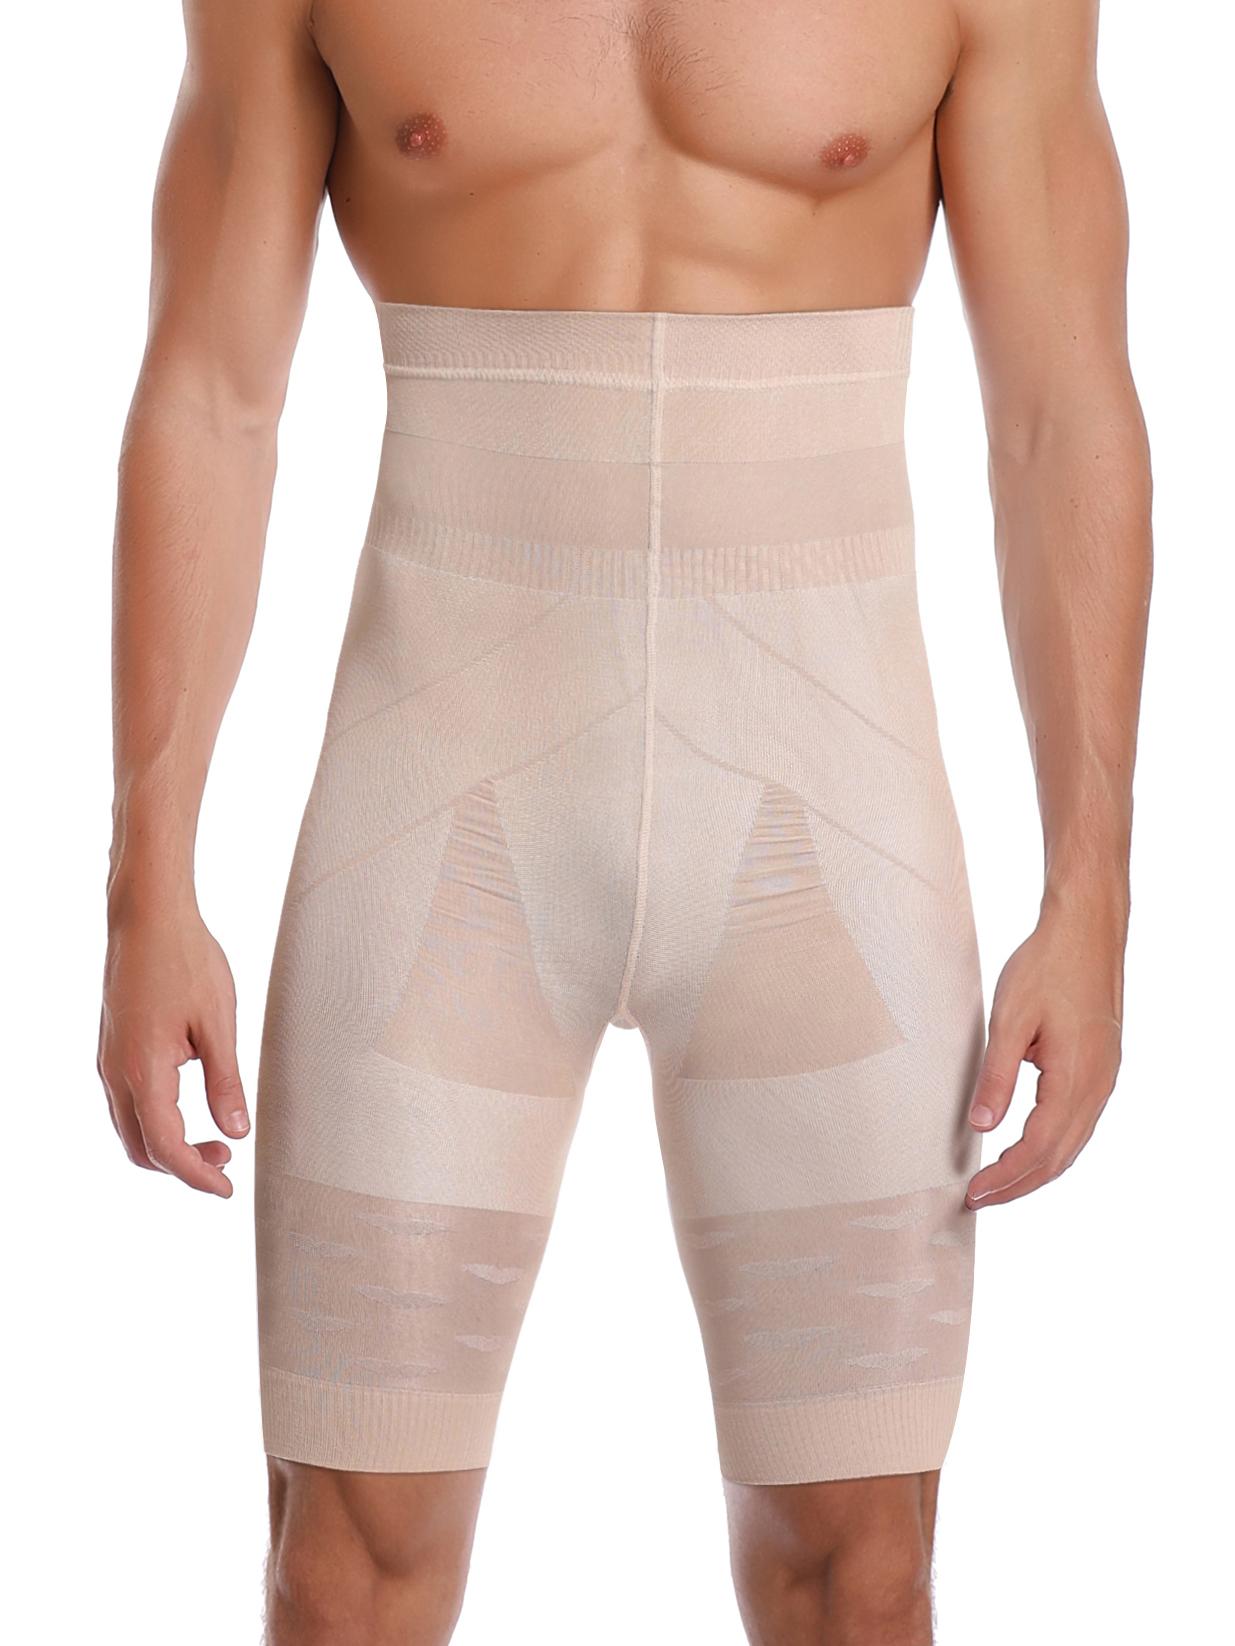 Mens Compression Slimming Body Shaper Girdle Pants High Waist Boxer Shorts Tummy